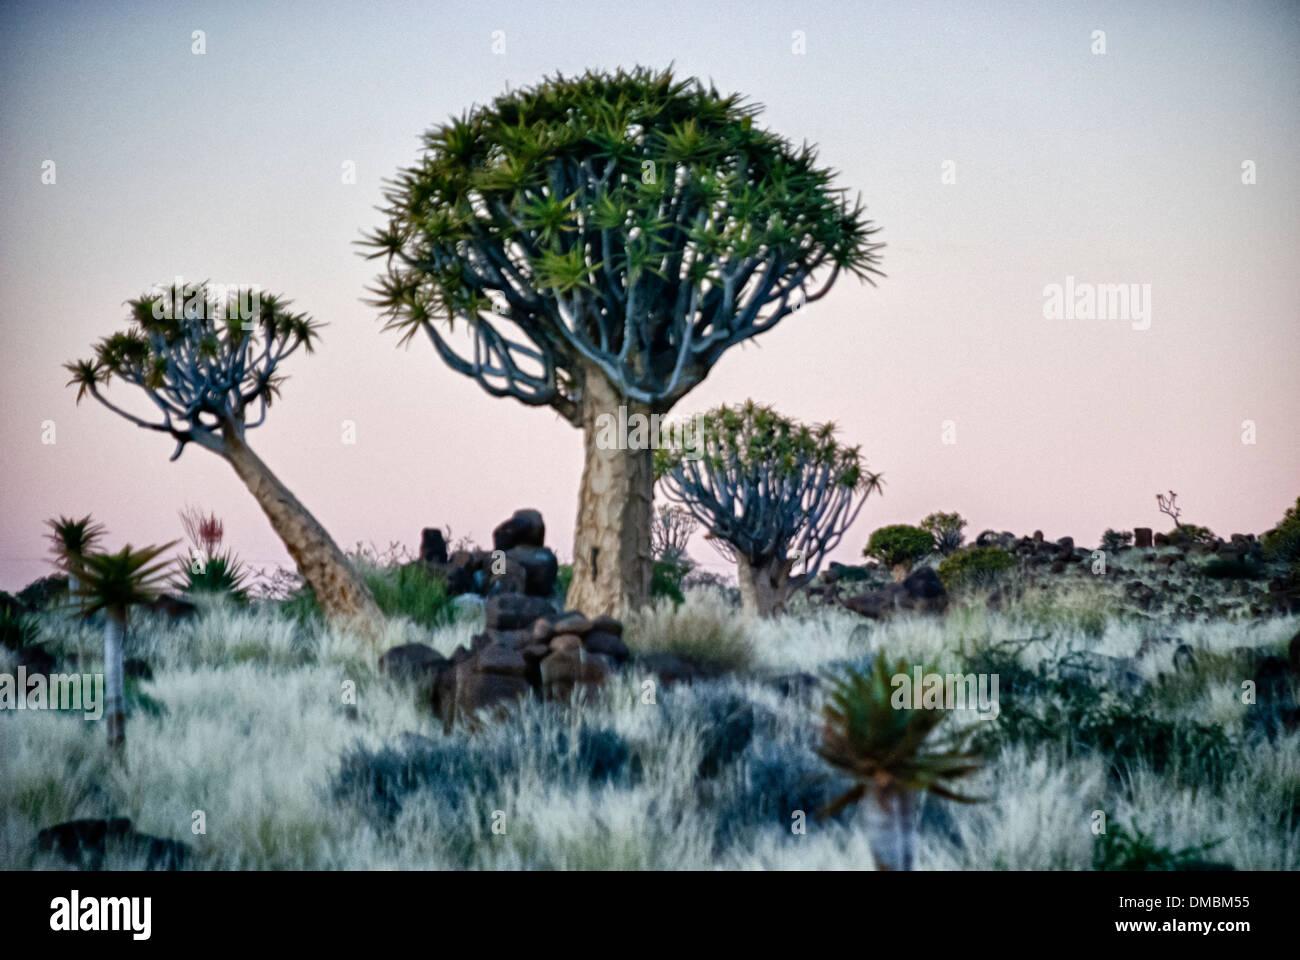 Temblar los árboles, Kocurboom, Aloe dichotoma carcaj árbol bosques, granjas, Keetmannshoop Gariganus, Namibia, África Imagen De Stock